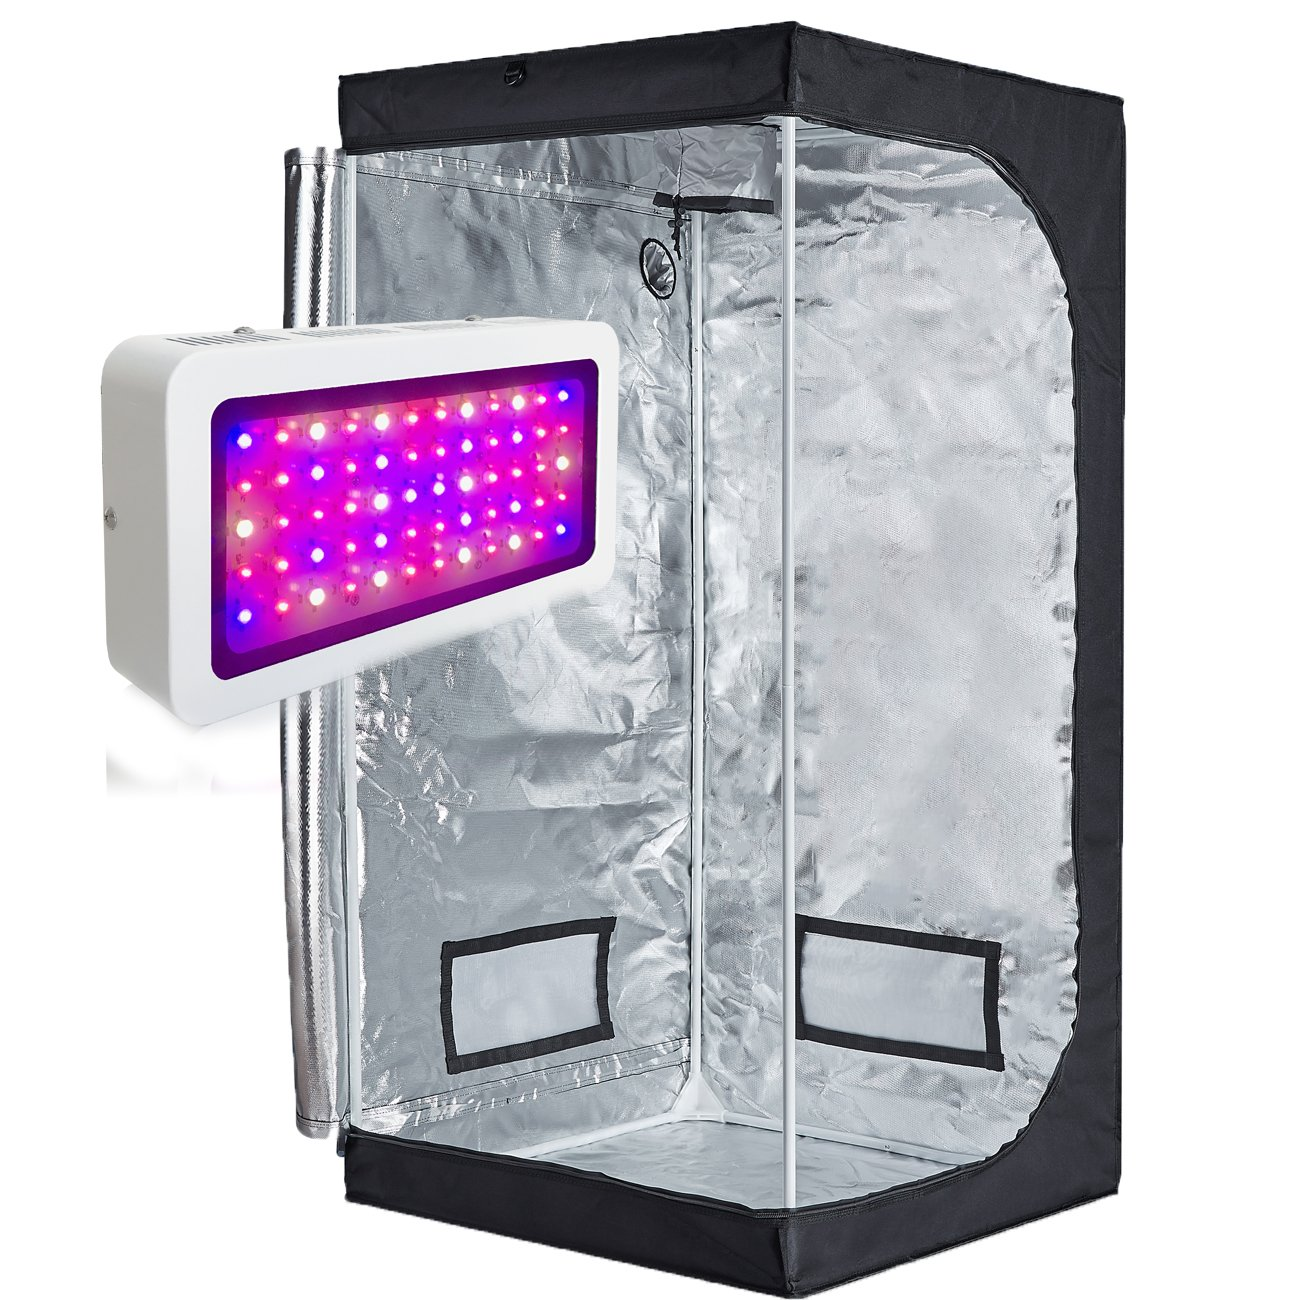 TopoLite 300W/ 600W/ 800W/ 1200W Full Spectrum LED Grow Light + Multiple Size Grow Tent Dark Room Indoor Hydroponic System Kit (LED 300W, 32''x32''x63'' D-Door)